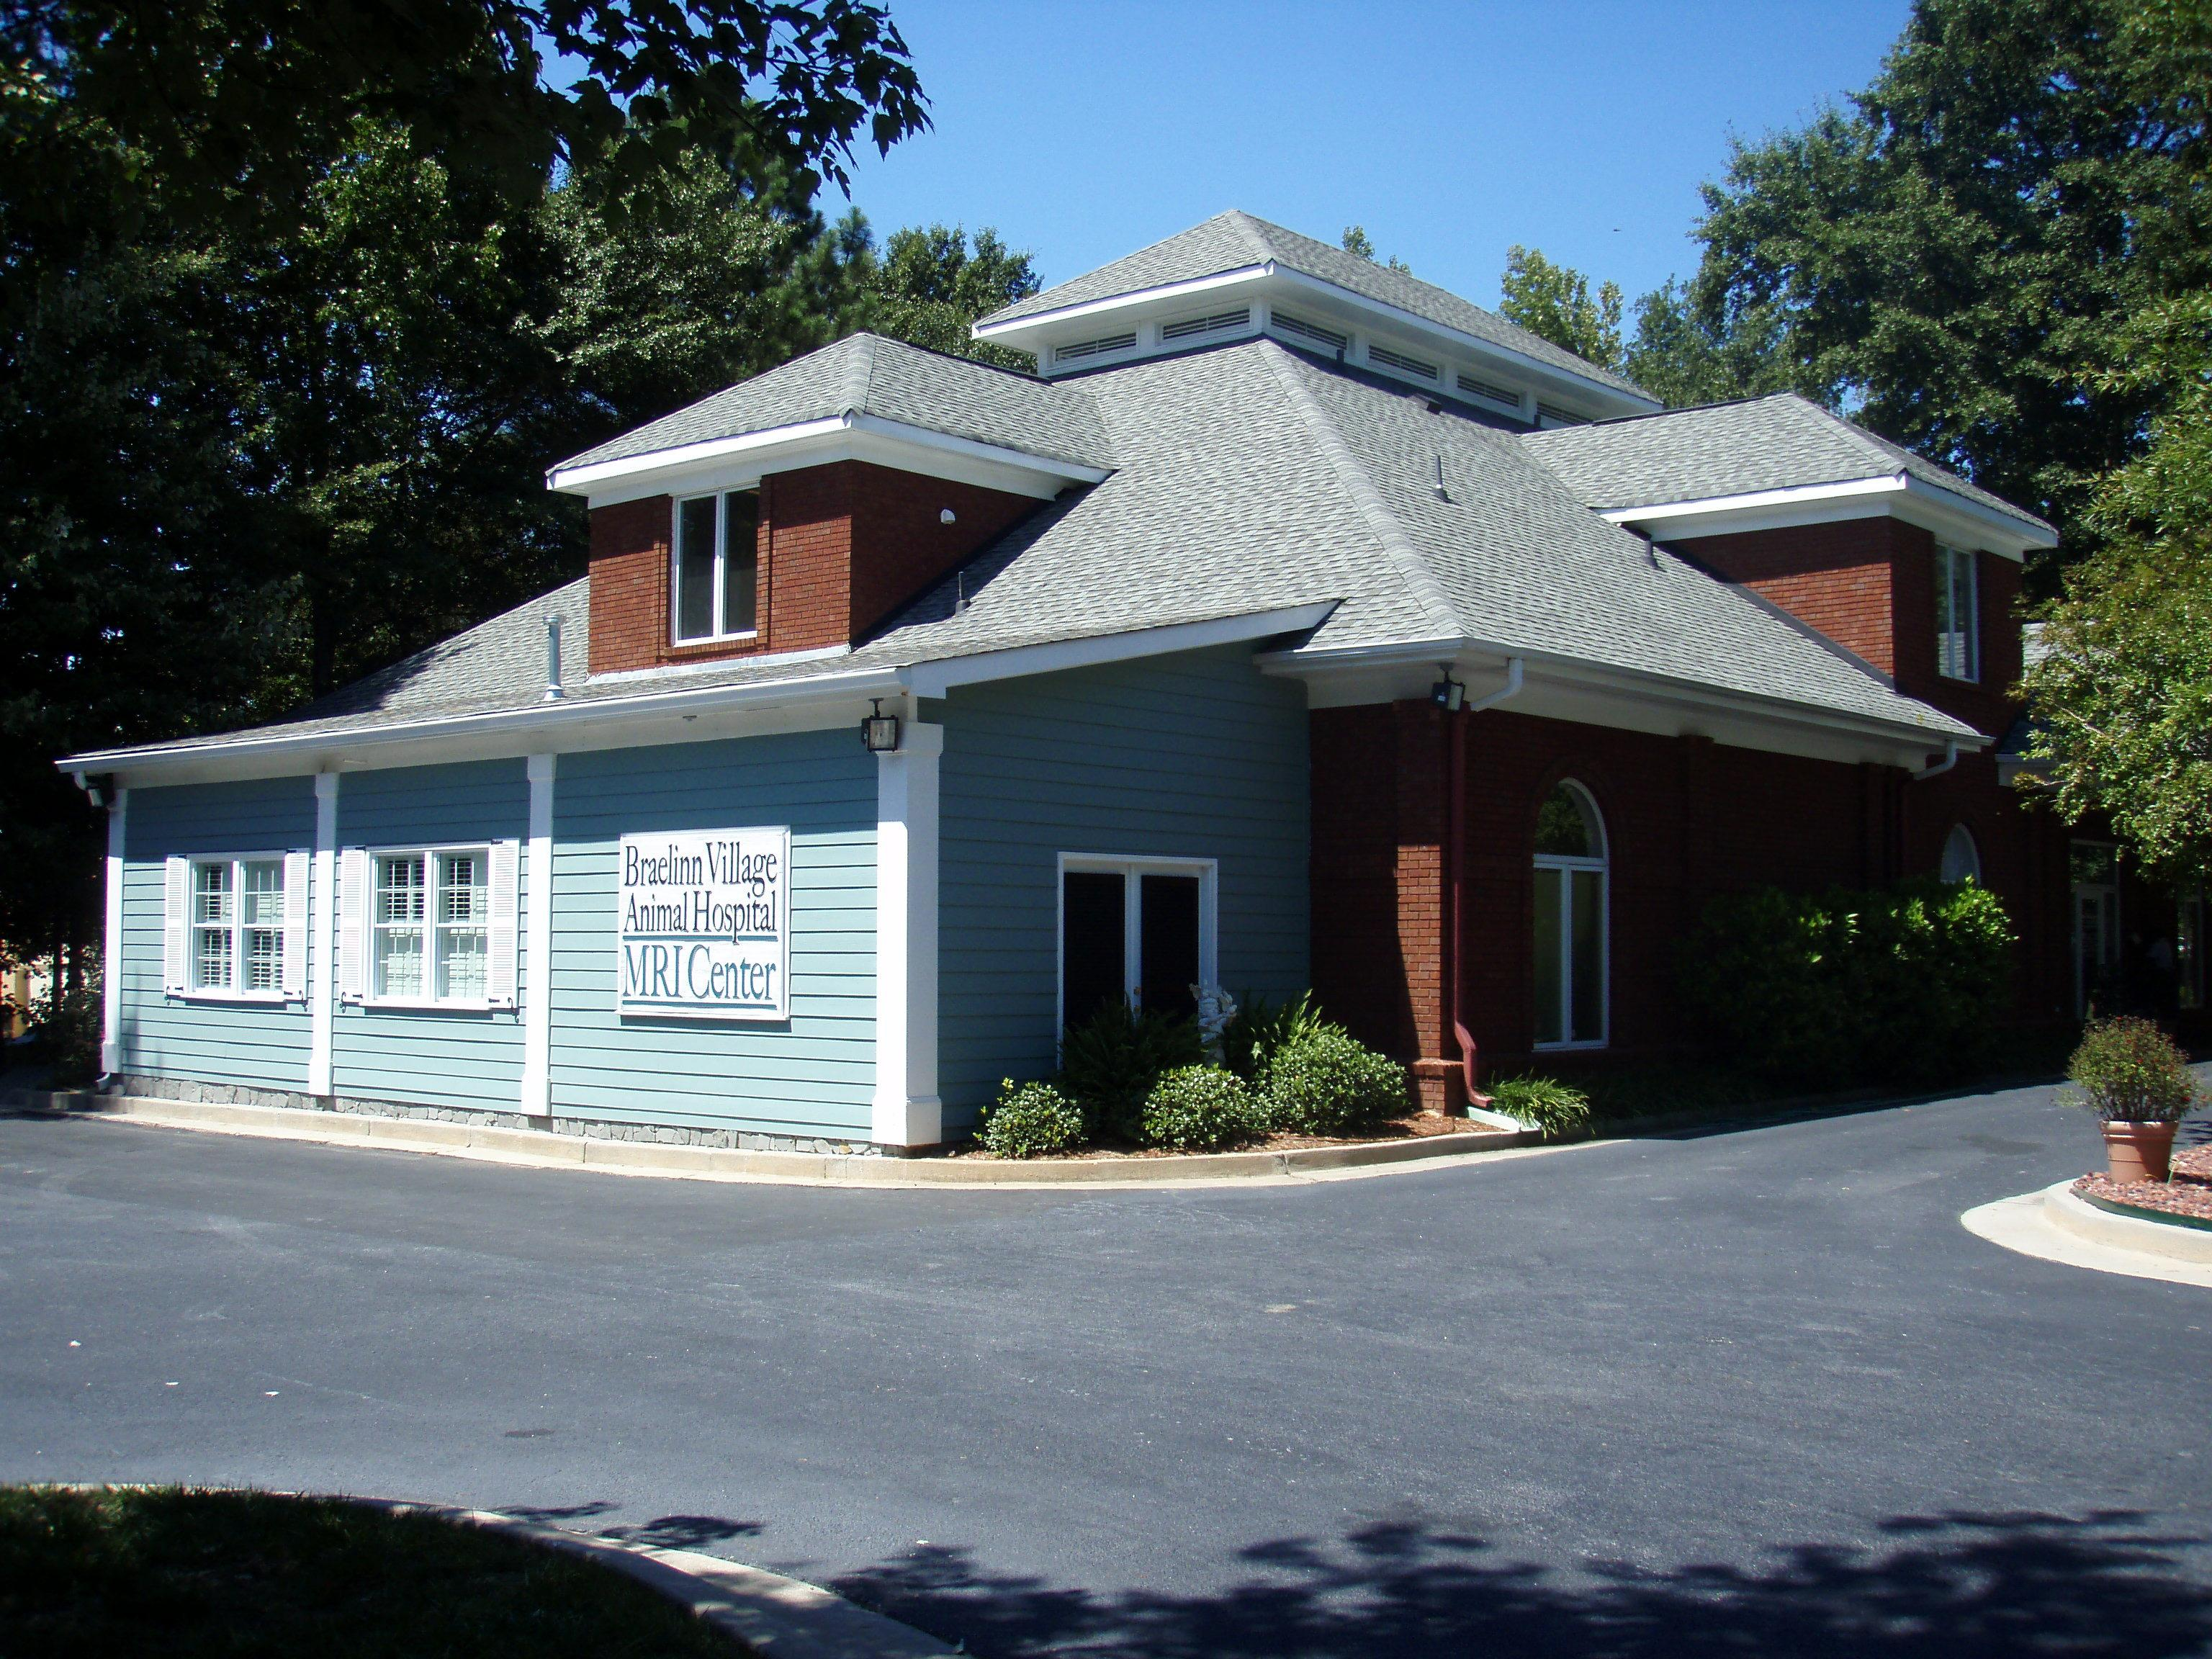 VCA Braelinn Village Animal Hospital image 1